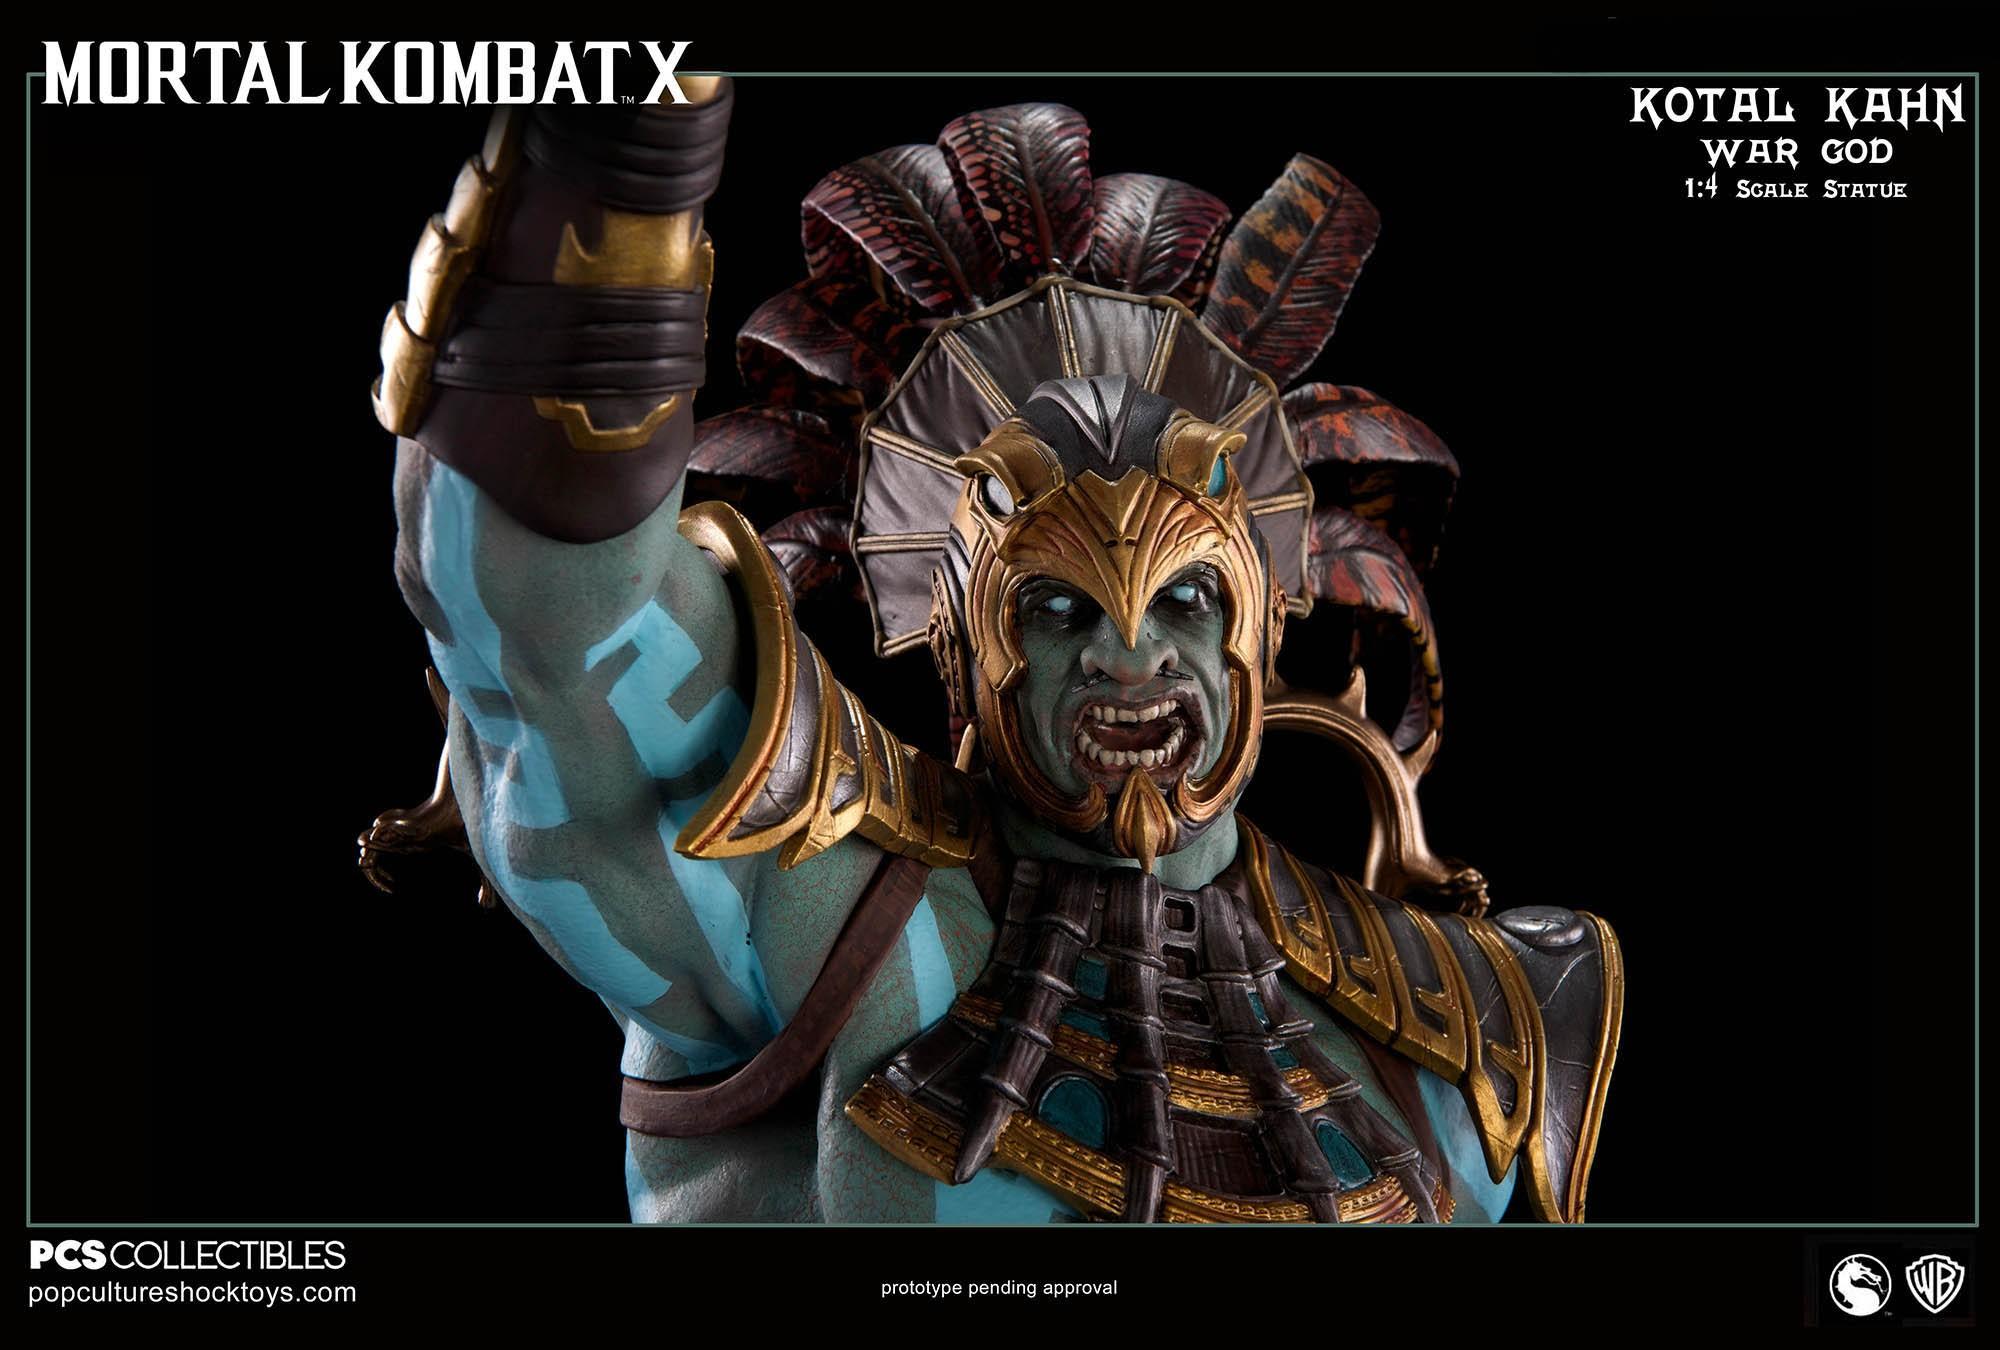 [Pop Culture Shock] Mortal Kombat X: Kotal Kahn 1:4 scale PCS-Kotal-Kahn-War-God-016